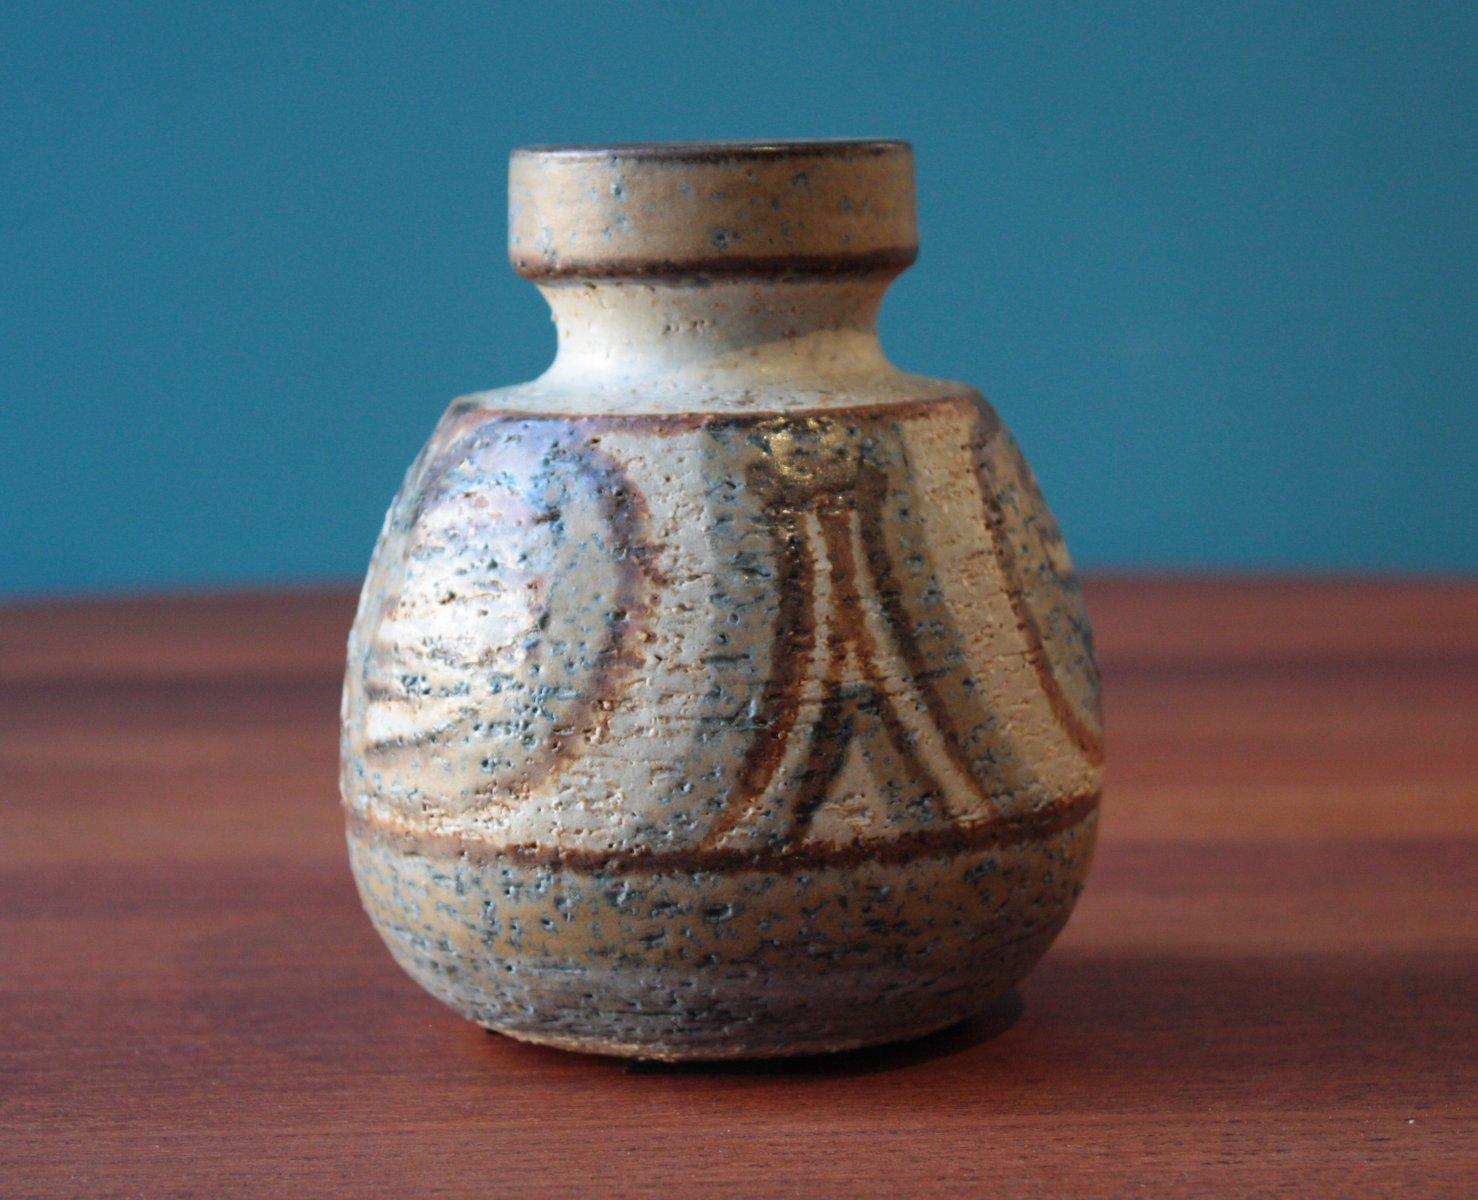 Small vintage ceramic vase by noomi backhausen for soholm stentoj small vintage ceramic vase by noomi backhausen for soholm stentoj denmark 1971 reviewsmspy